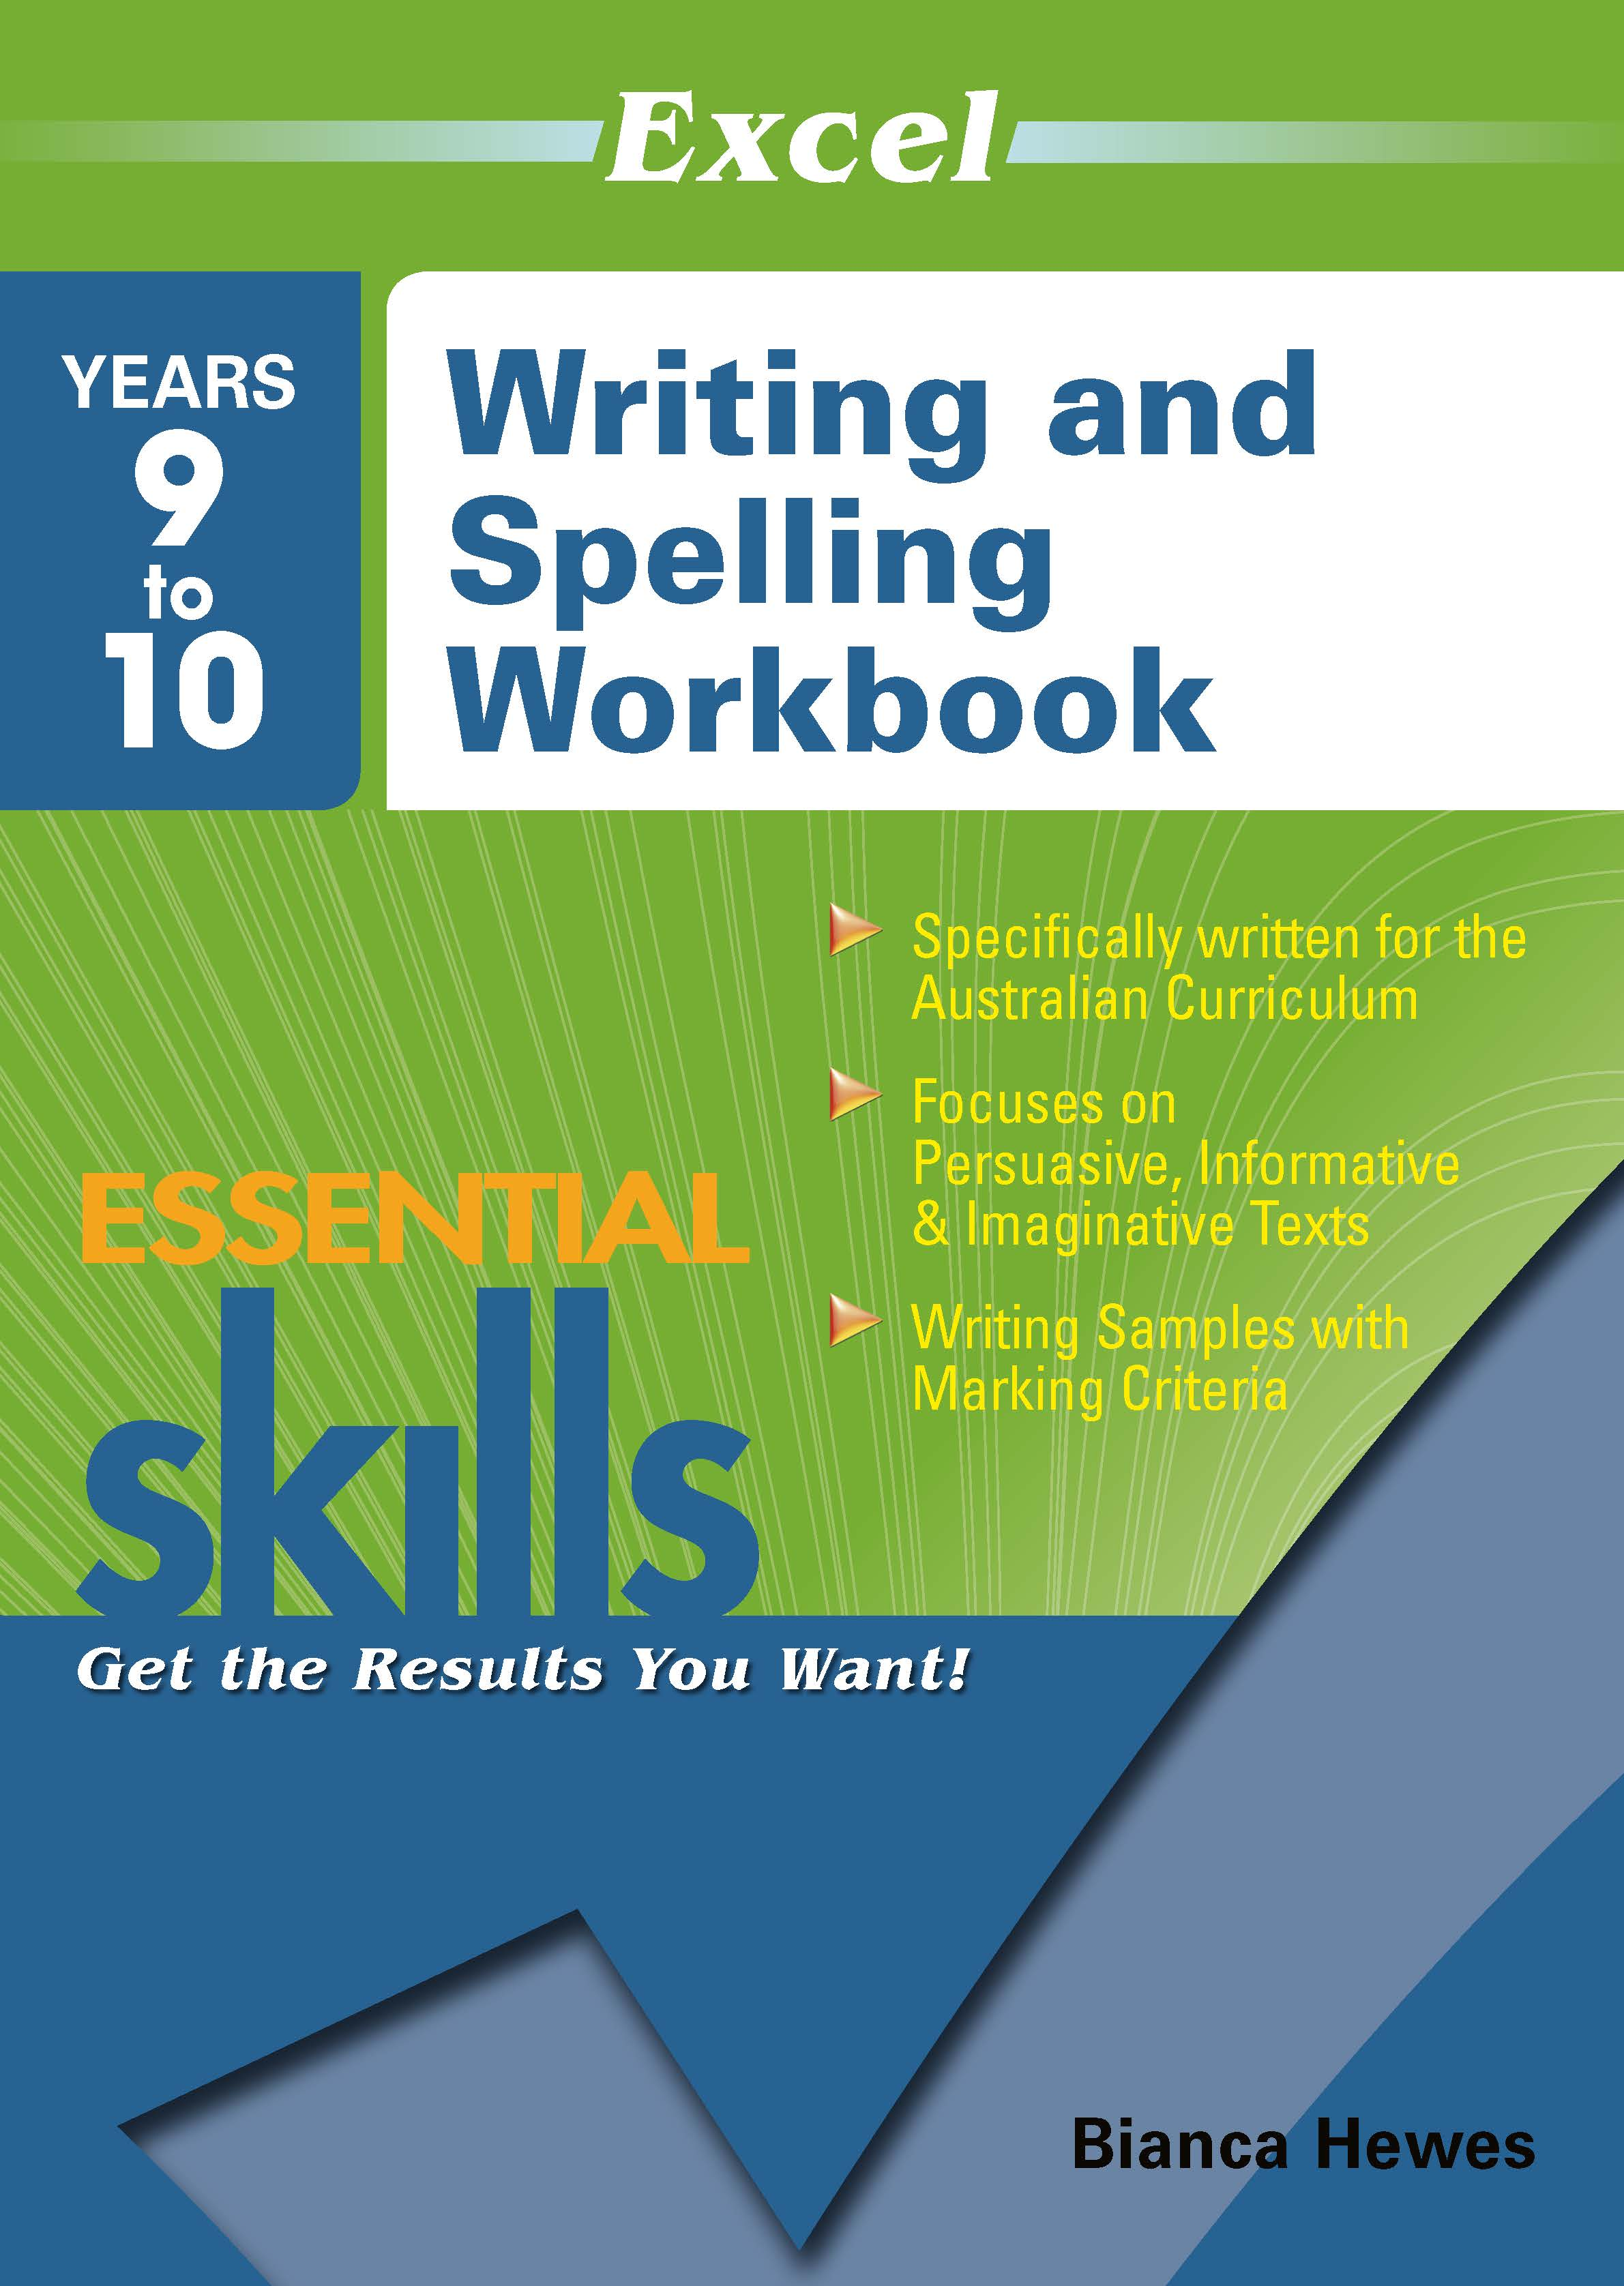 Excel Essential Skills: Writing and Spelling Workbook Years 9-10